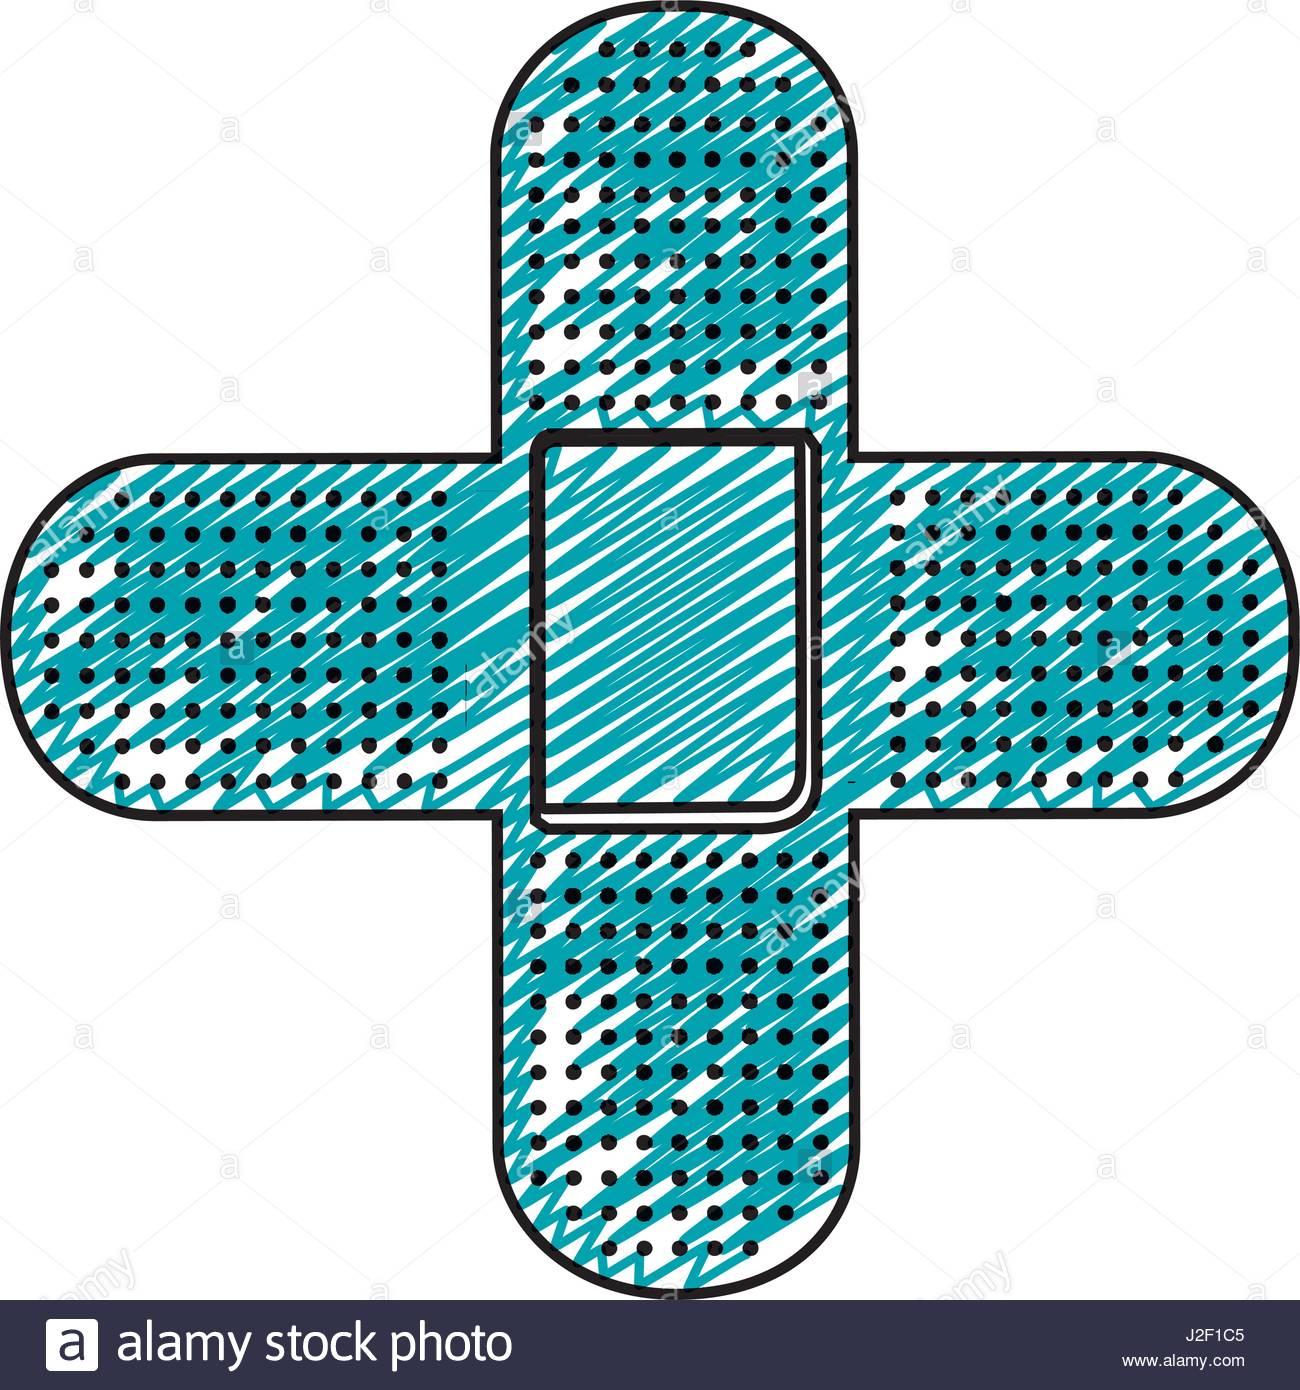 Bandaid clipart cross. Drawing at getdrawings com